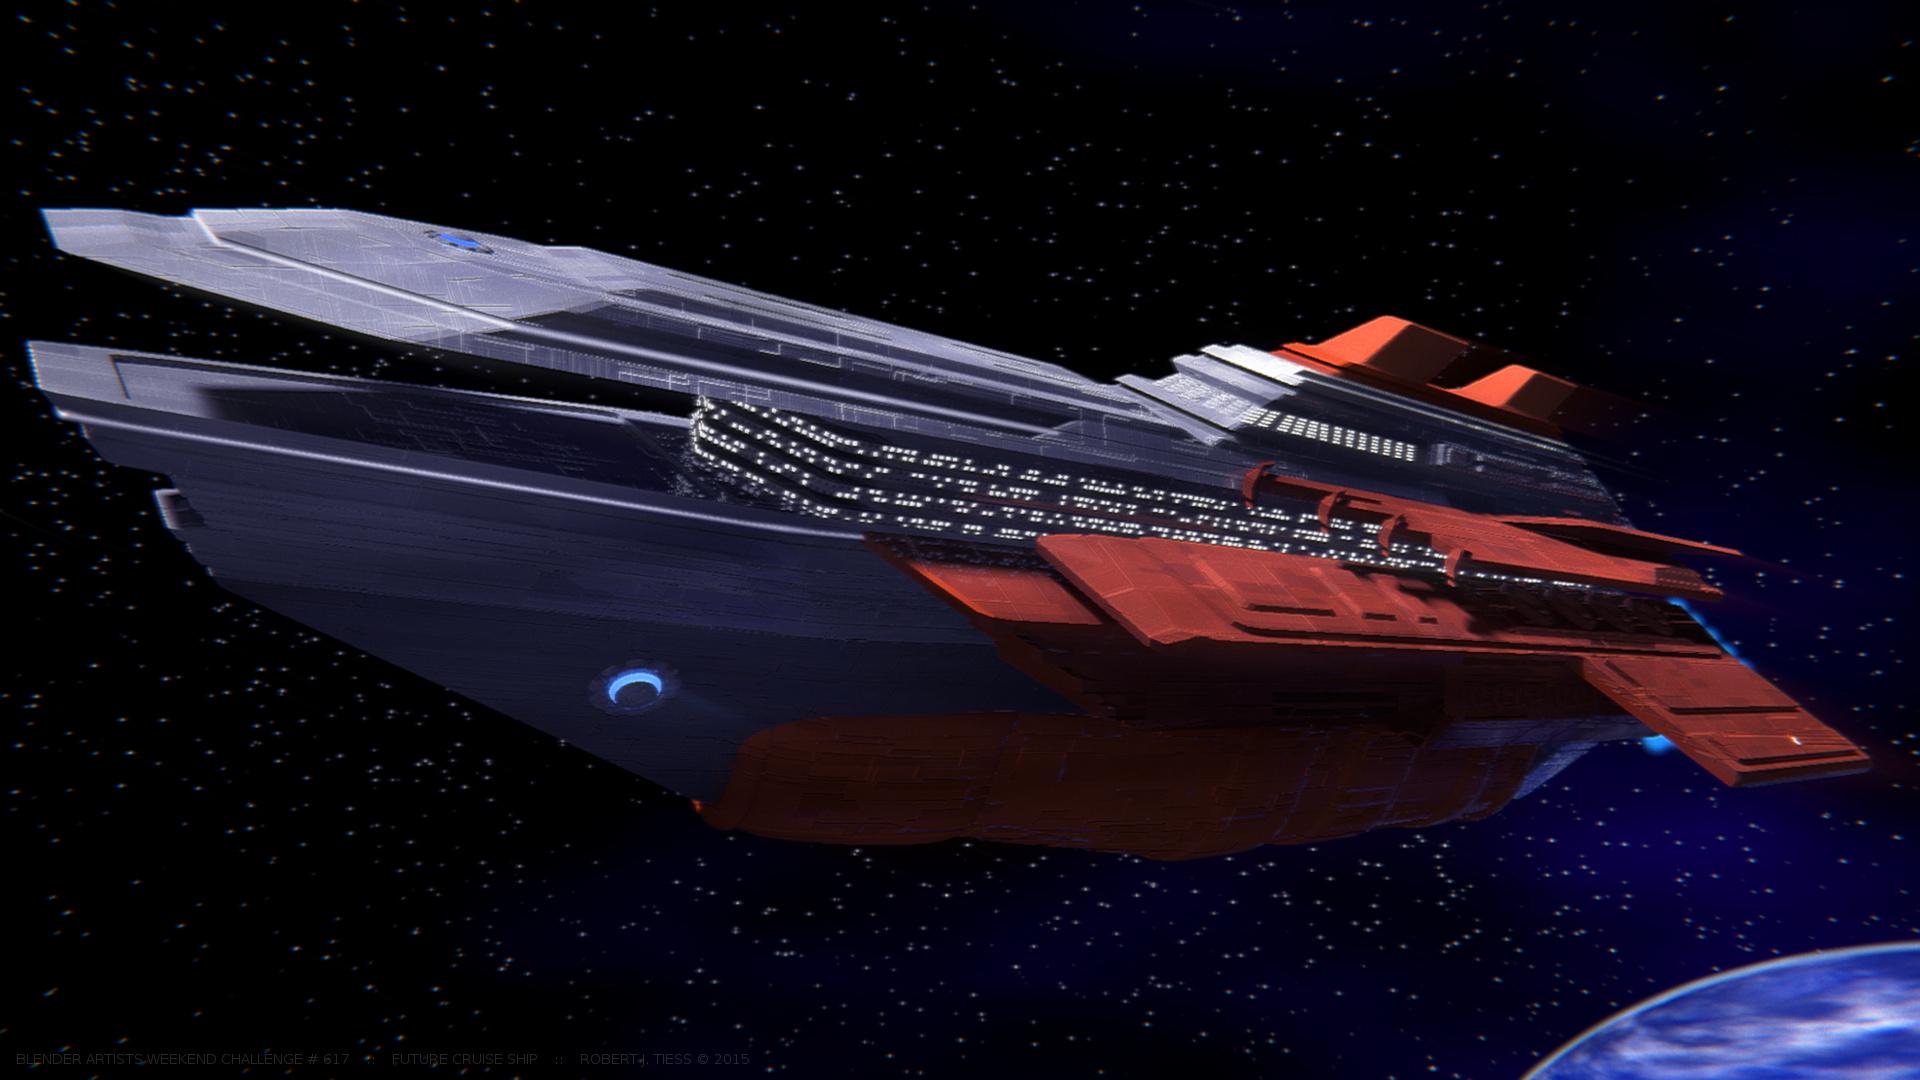 Future Cruise Ship - By Robert J. Tiess